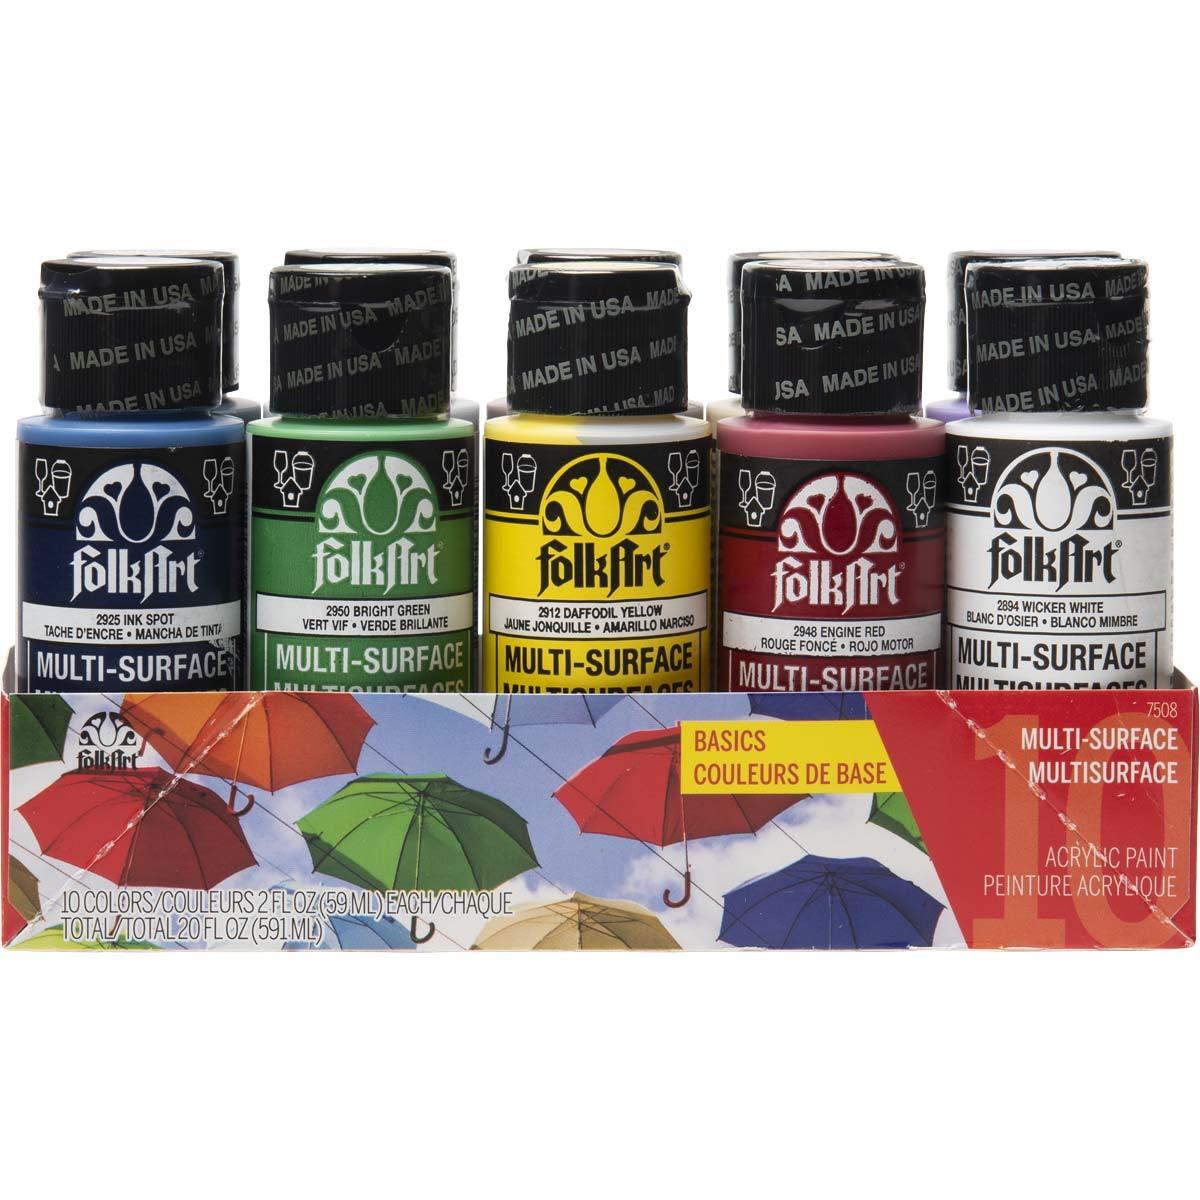 FolkArt 7508 Color, 10 Bottle Multi-Surface Acrylic Paint Set, 2oz, Basics